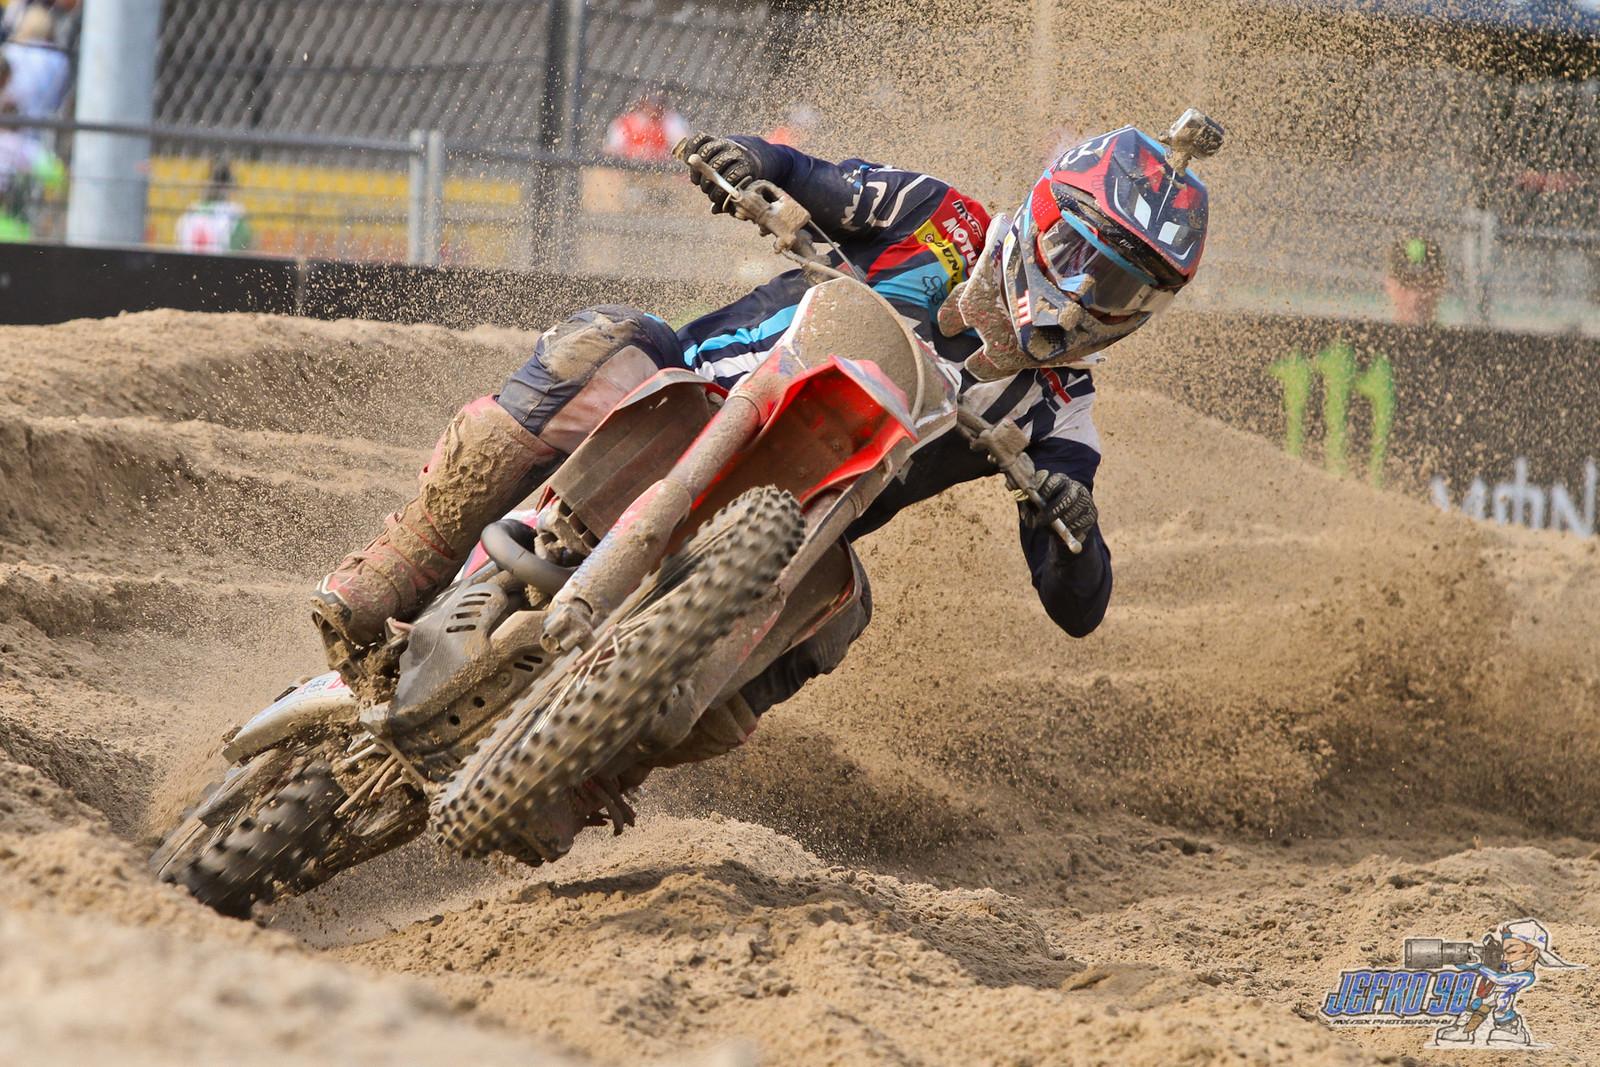 Evgeny Bobryshev - Photo Gallery: MXGP of the Netherlands - Motocross Pictures - Vital MX